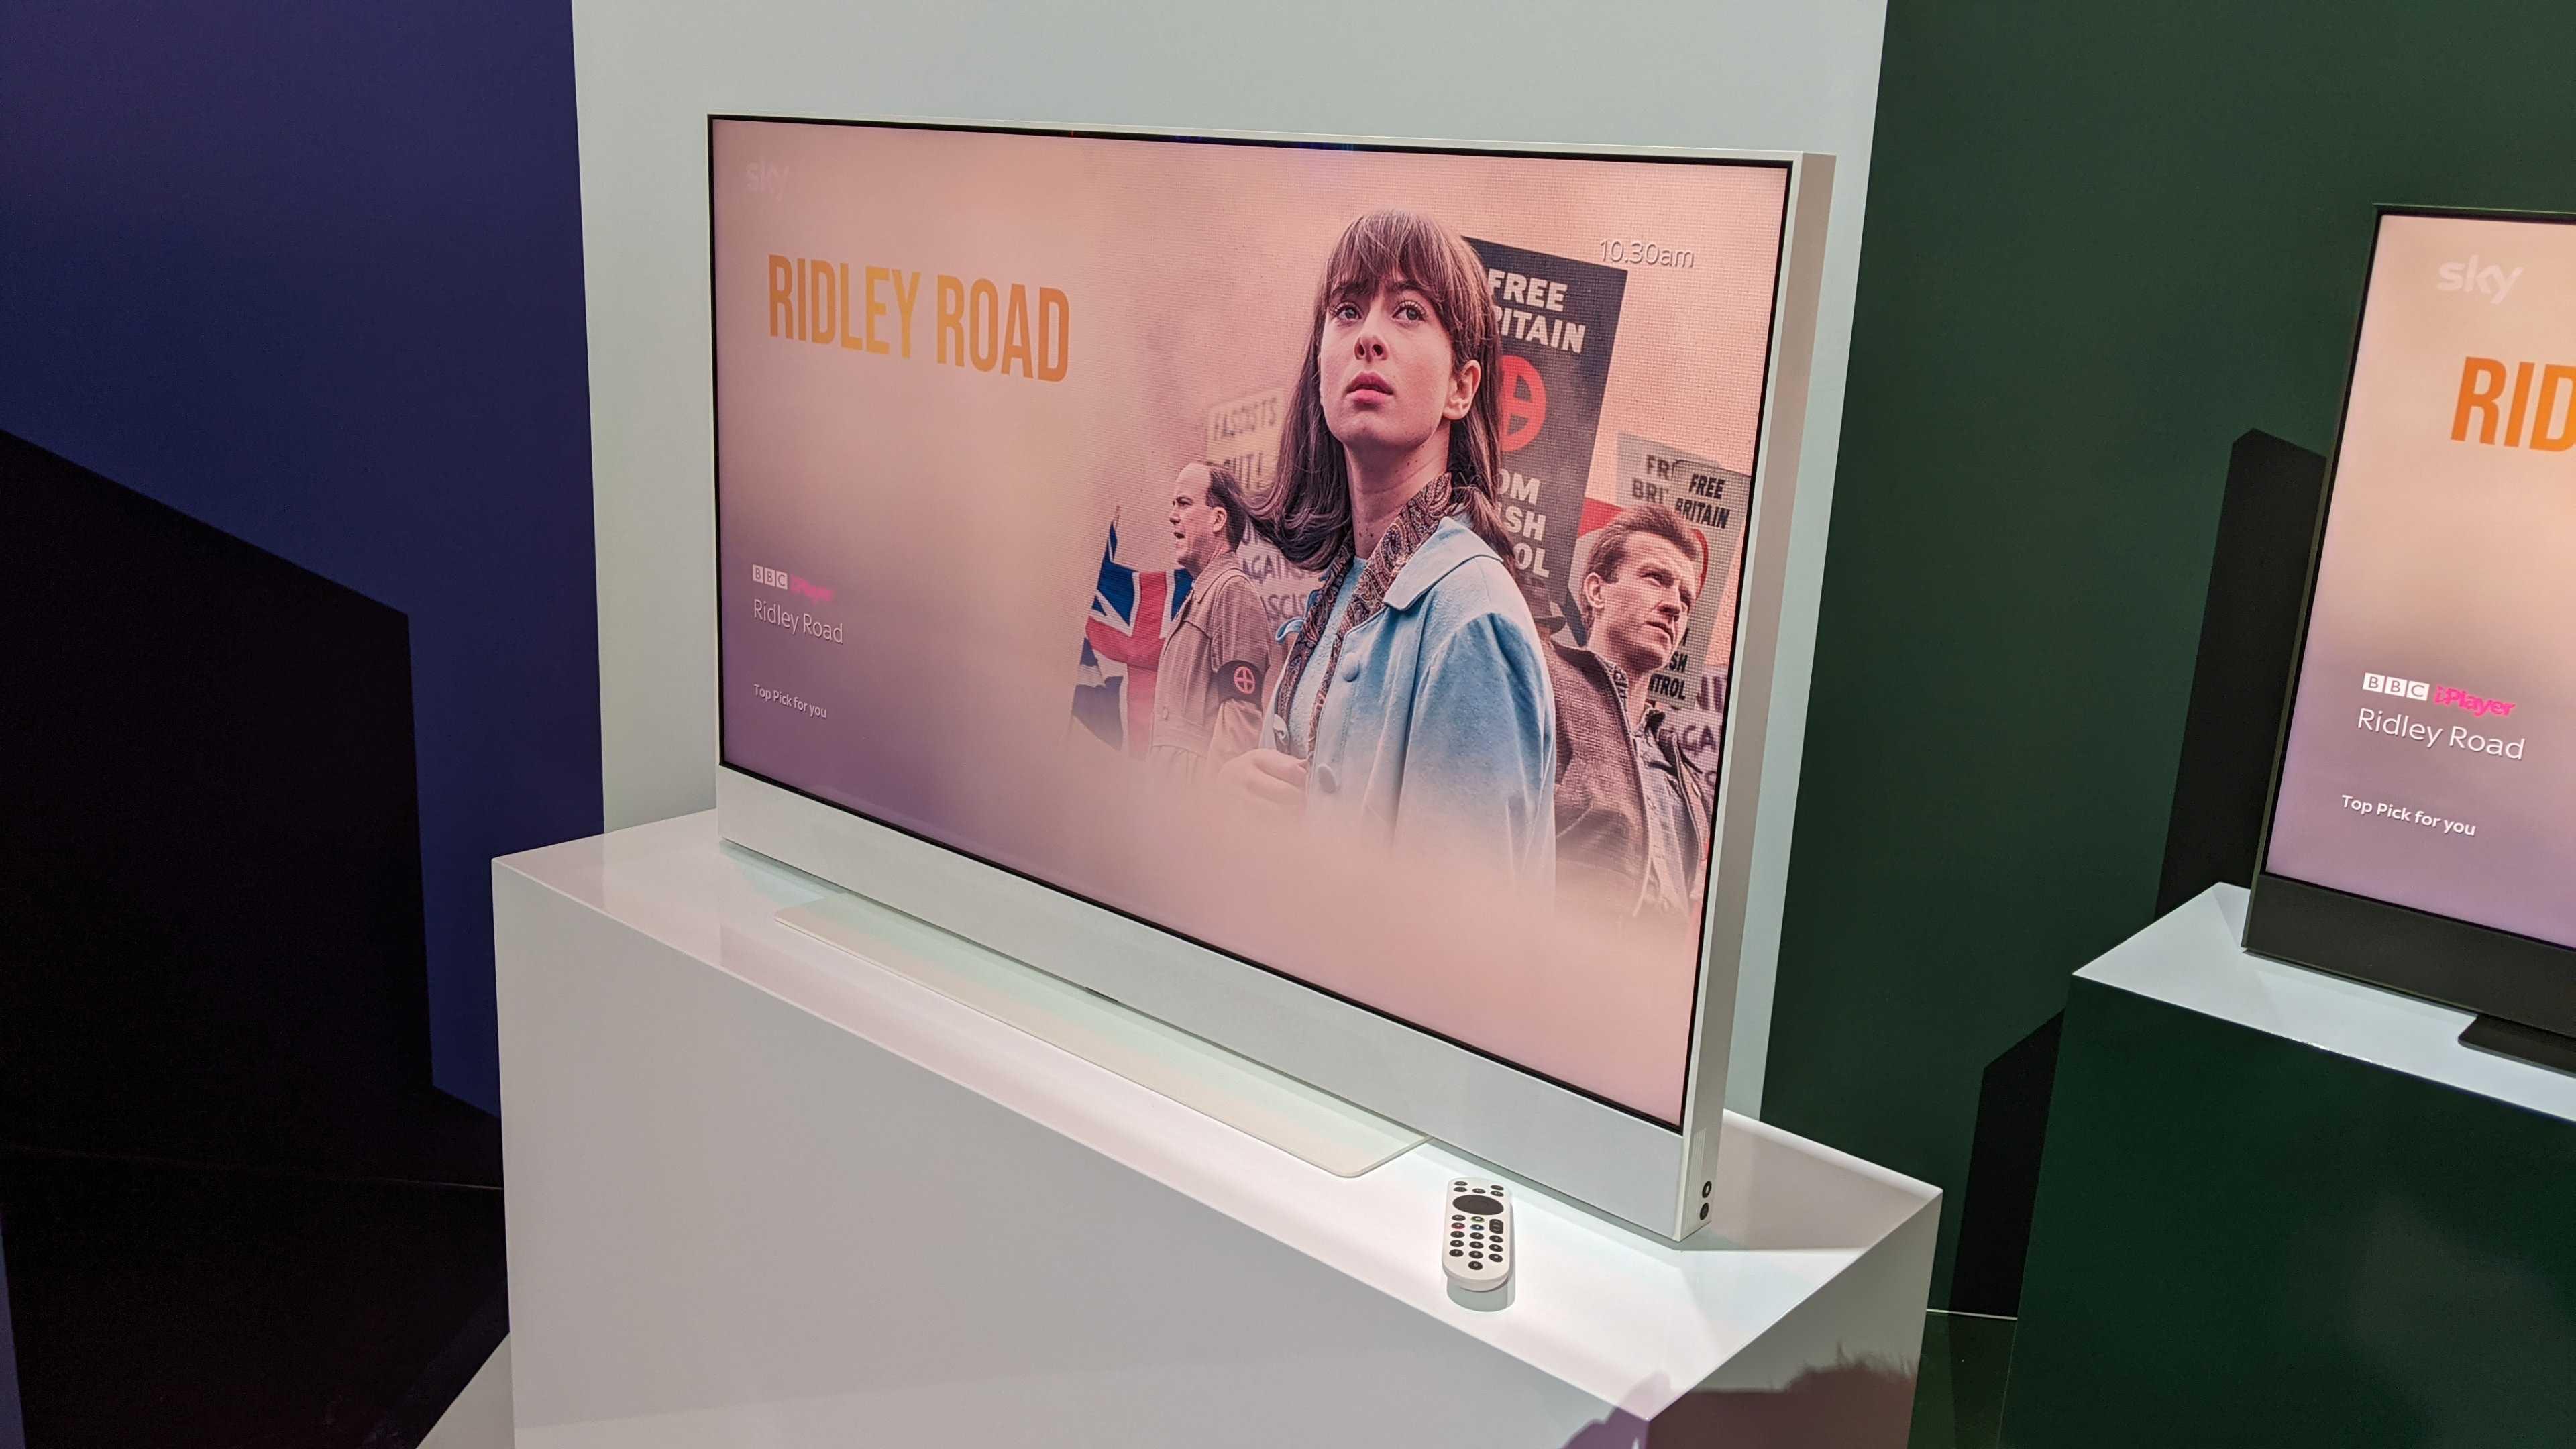 Sky Glass TV and remotes